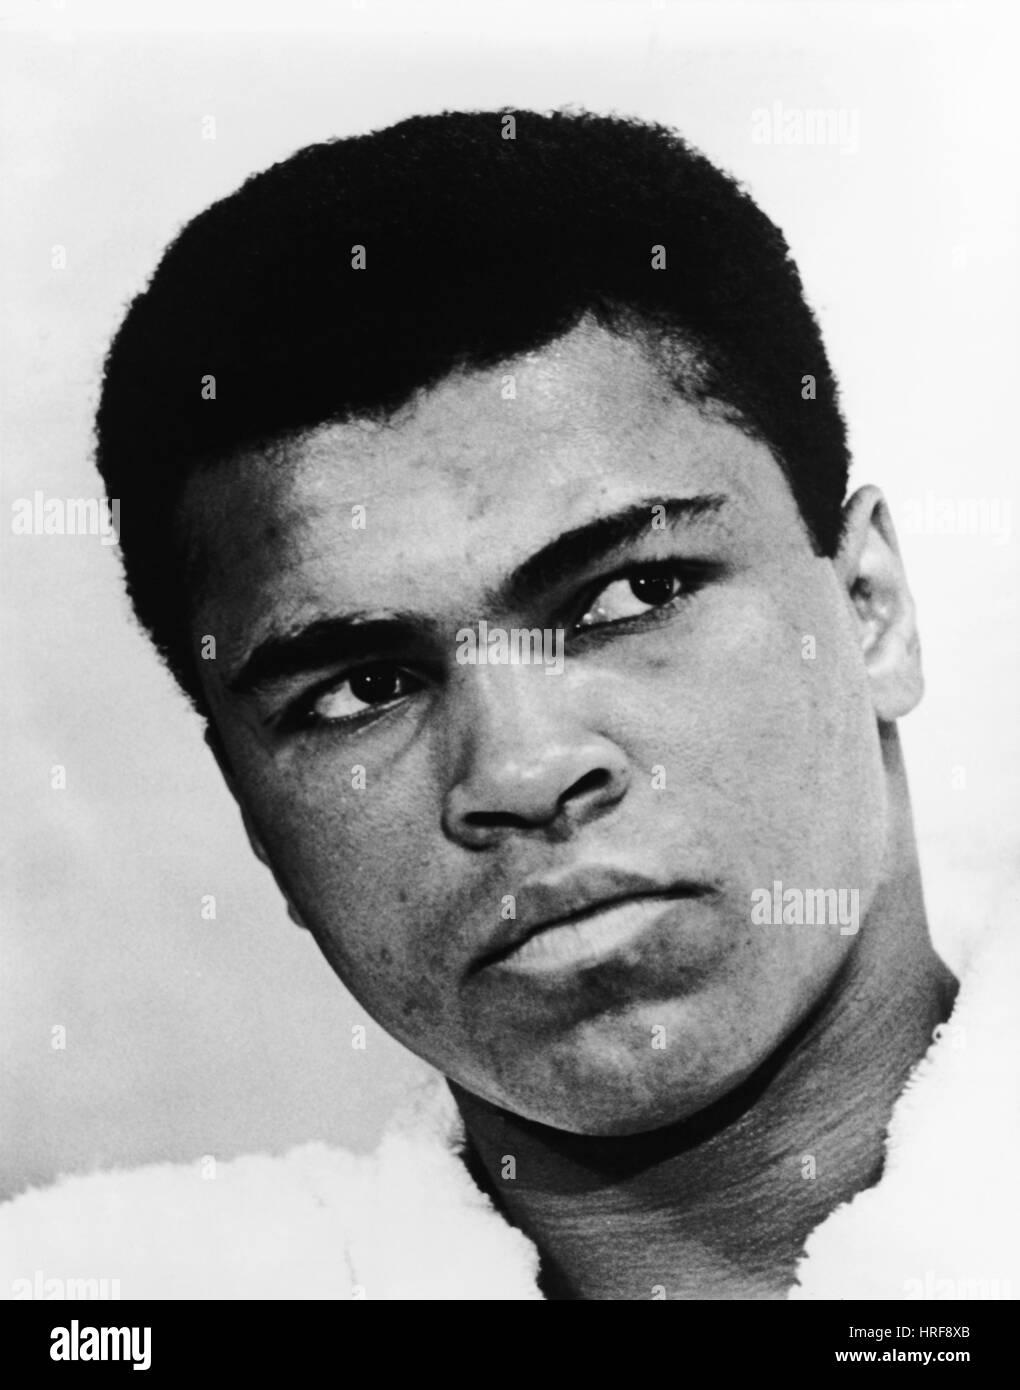 Muhammad Ali, The Greatest - Stock Image